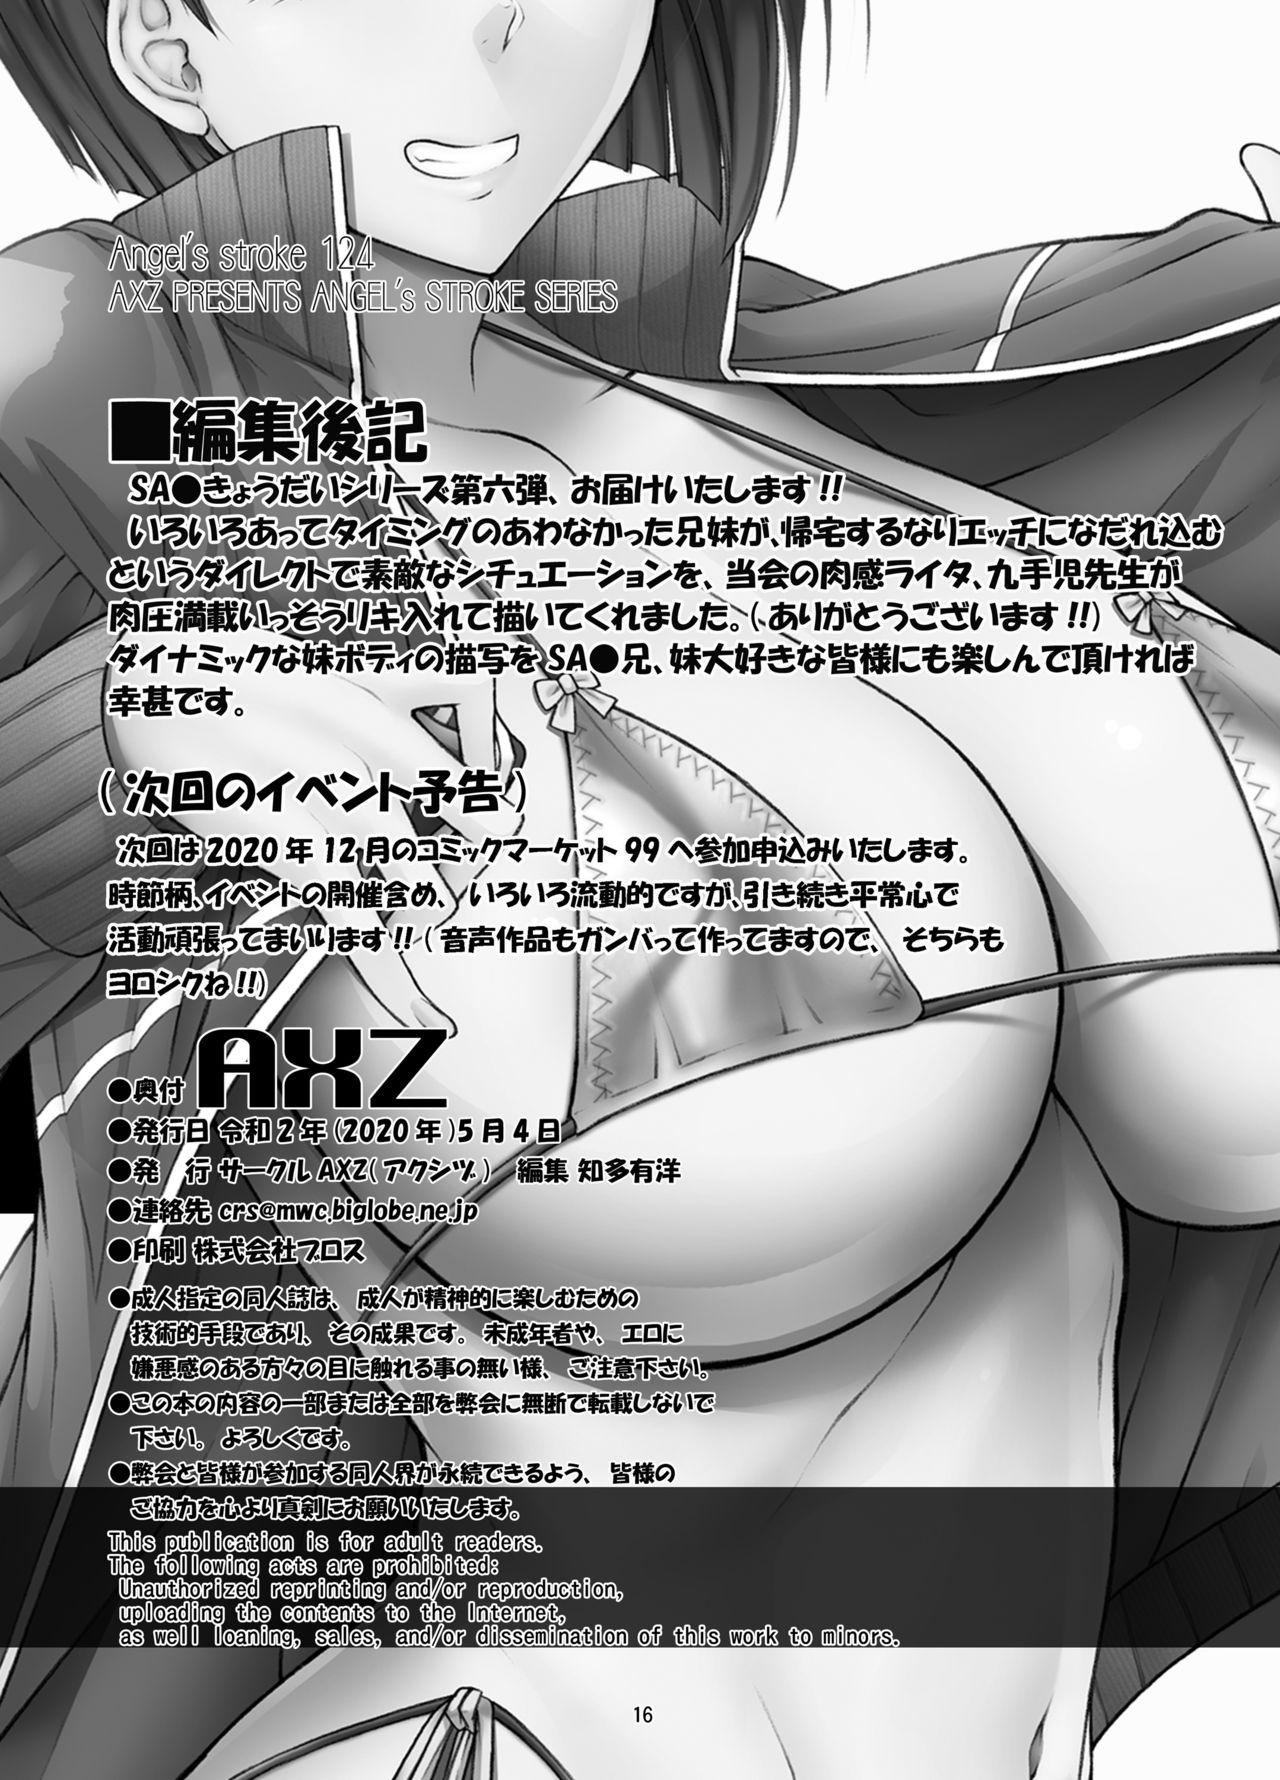 [AXZ (Kutani)] Angel's stroke 124 Sugu Suku 6 - Onii-chan to no Love Love Taikyuu Sex (Sword Art Online) [Digital] 16